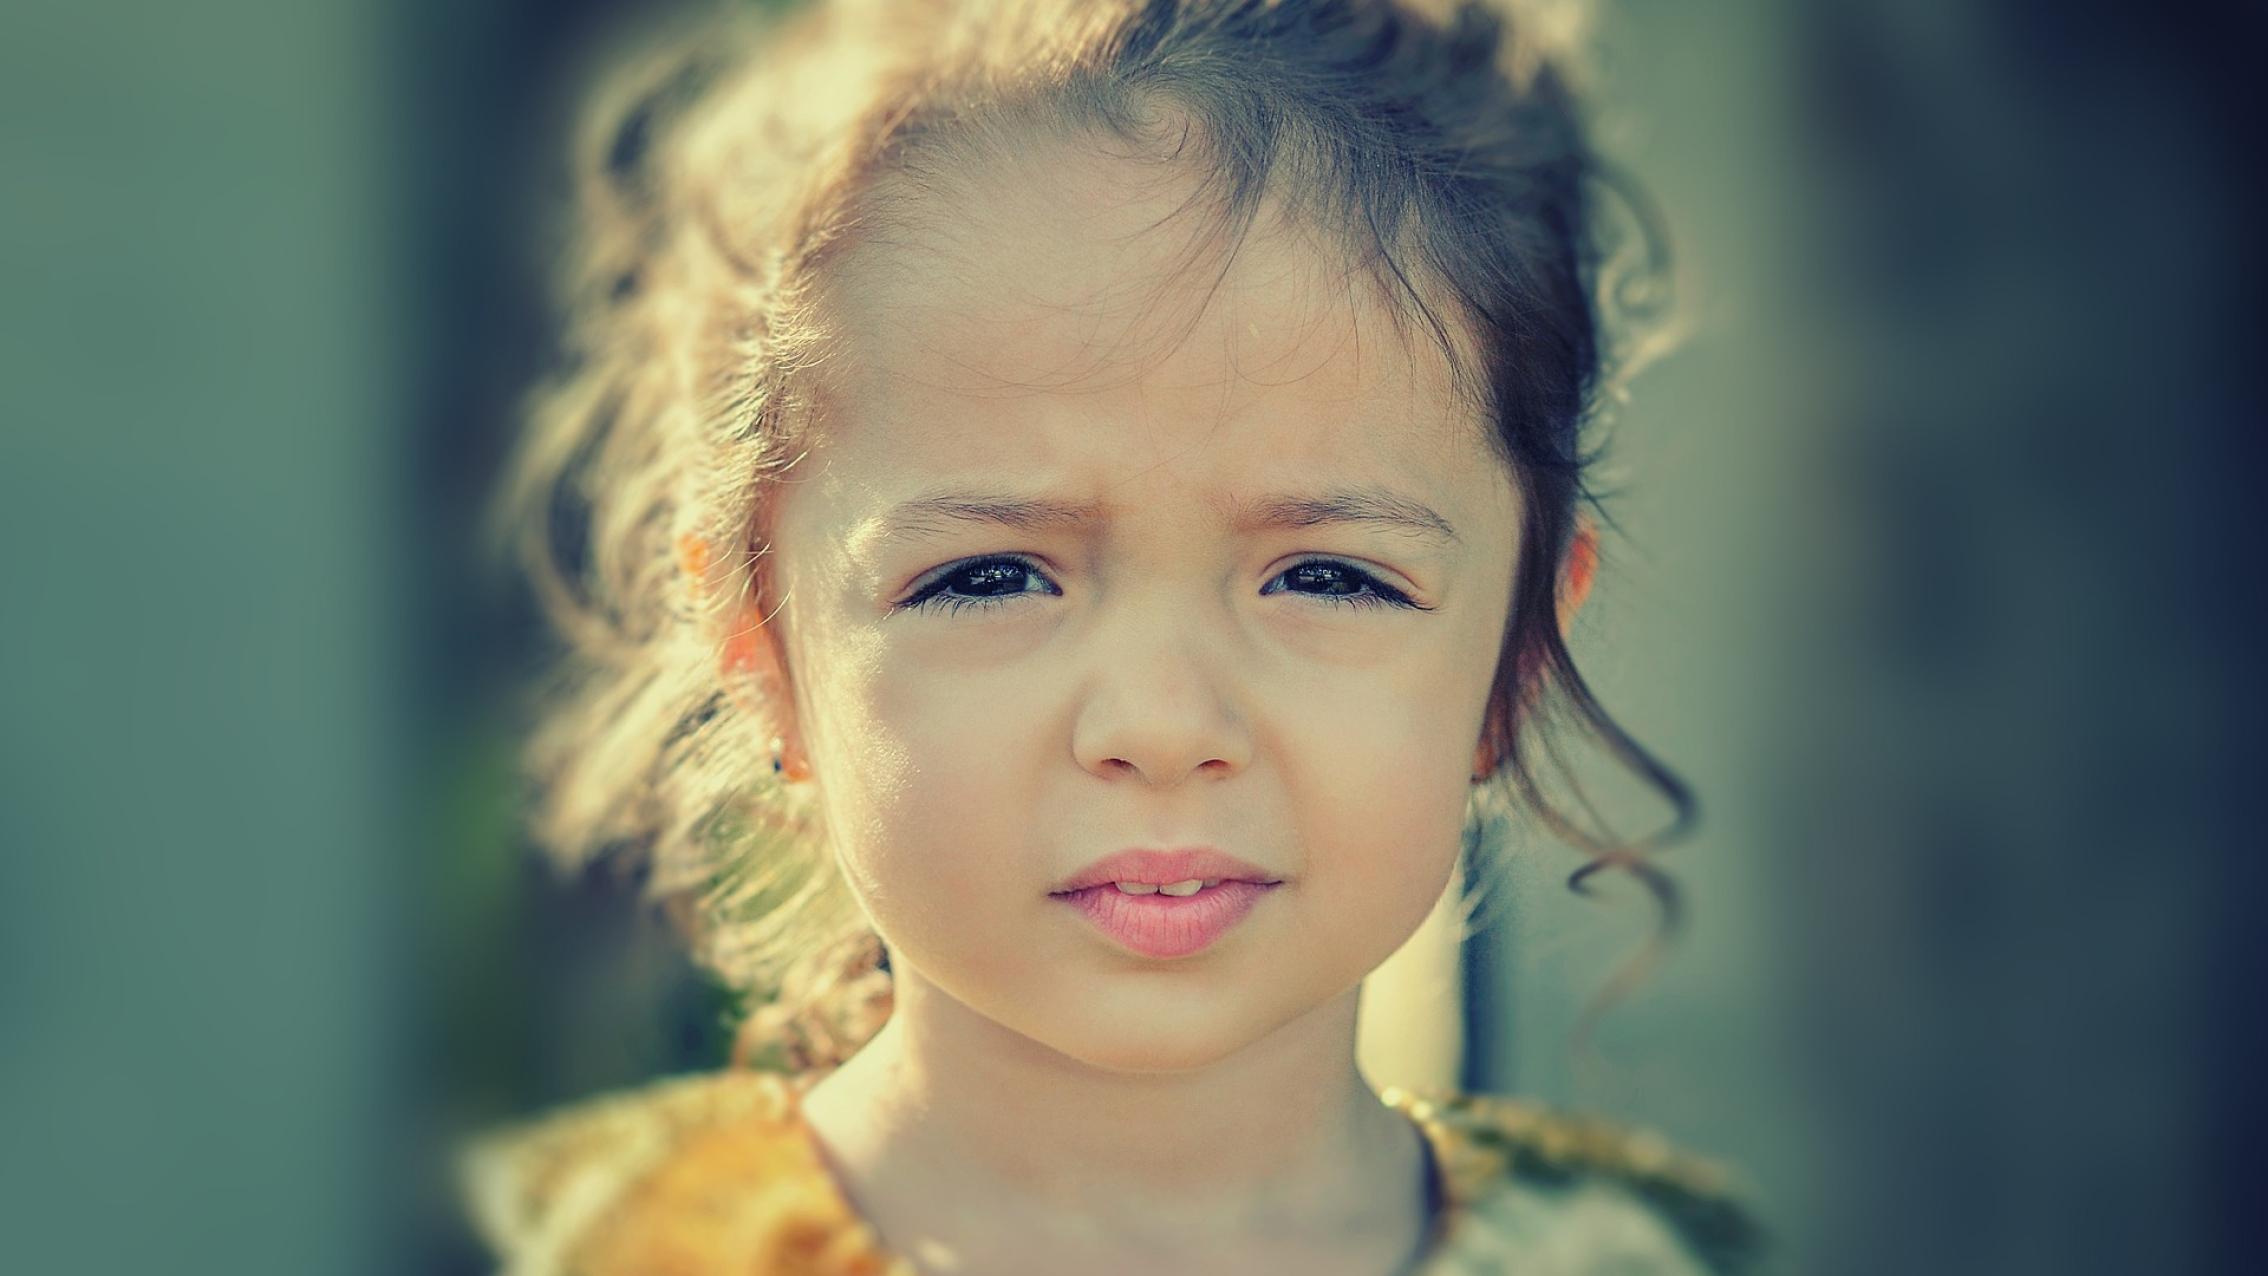 Girl Face Worried Health